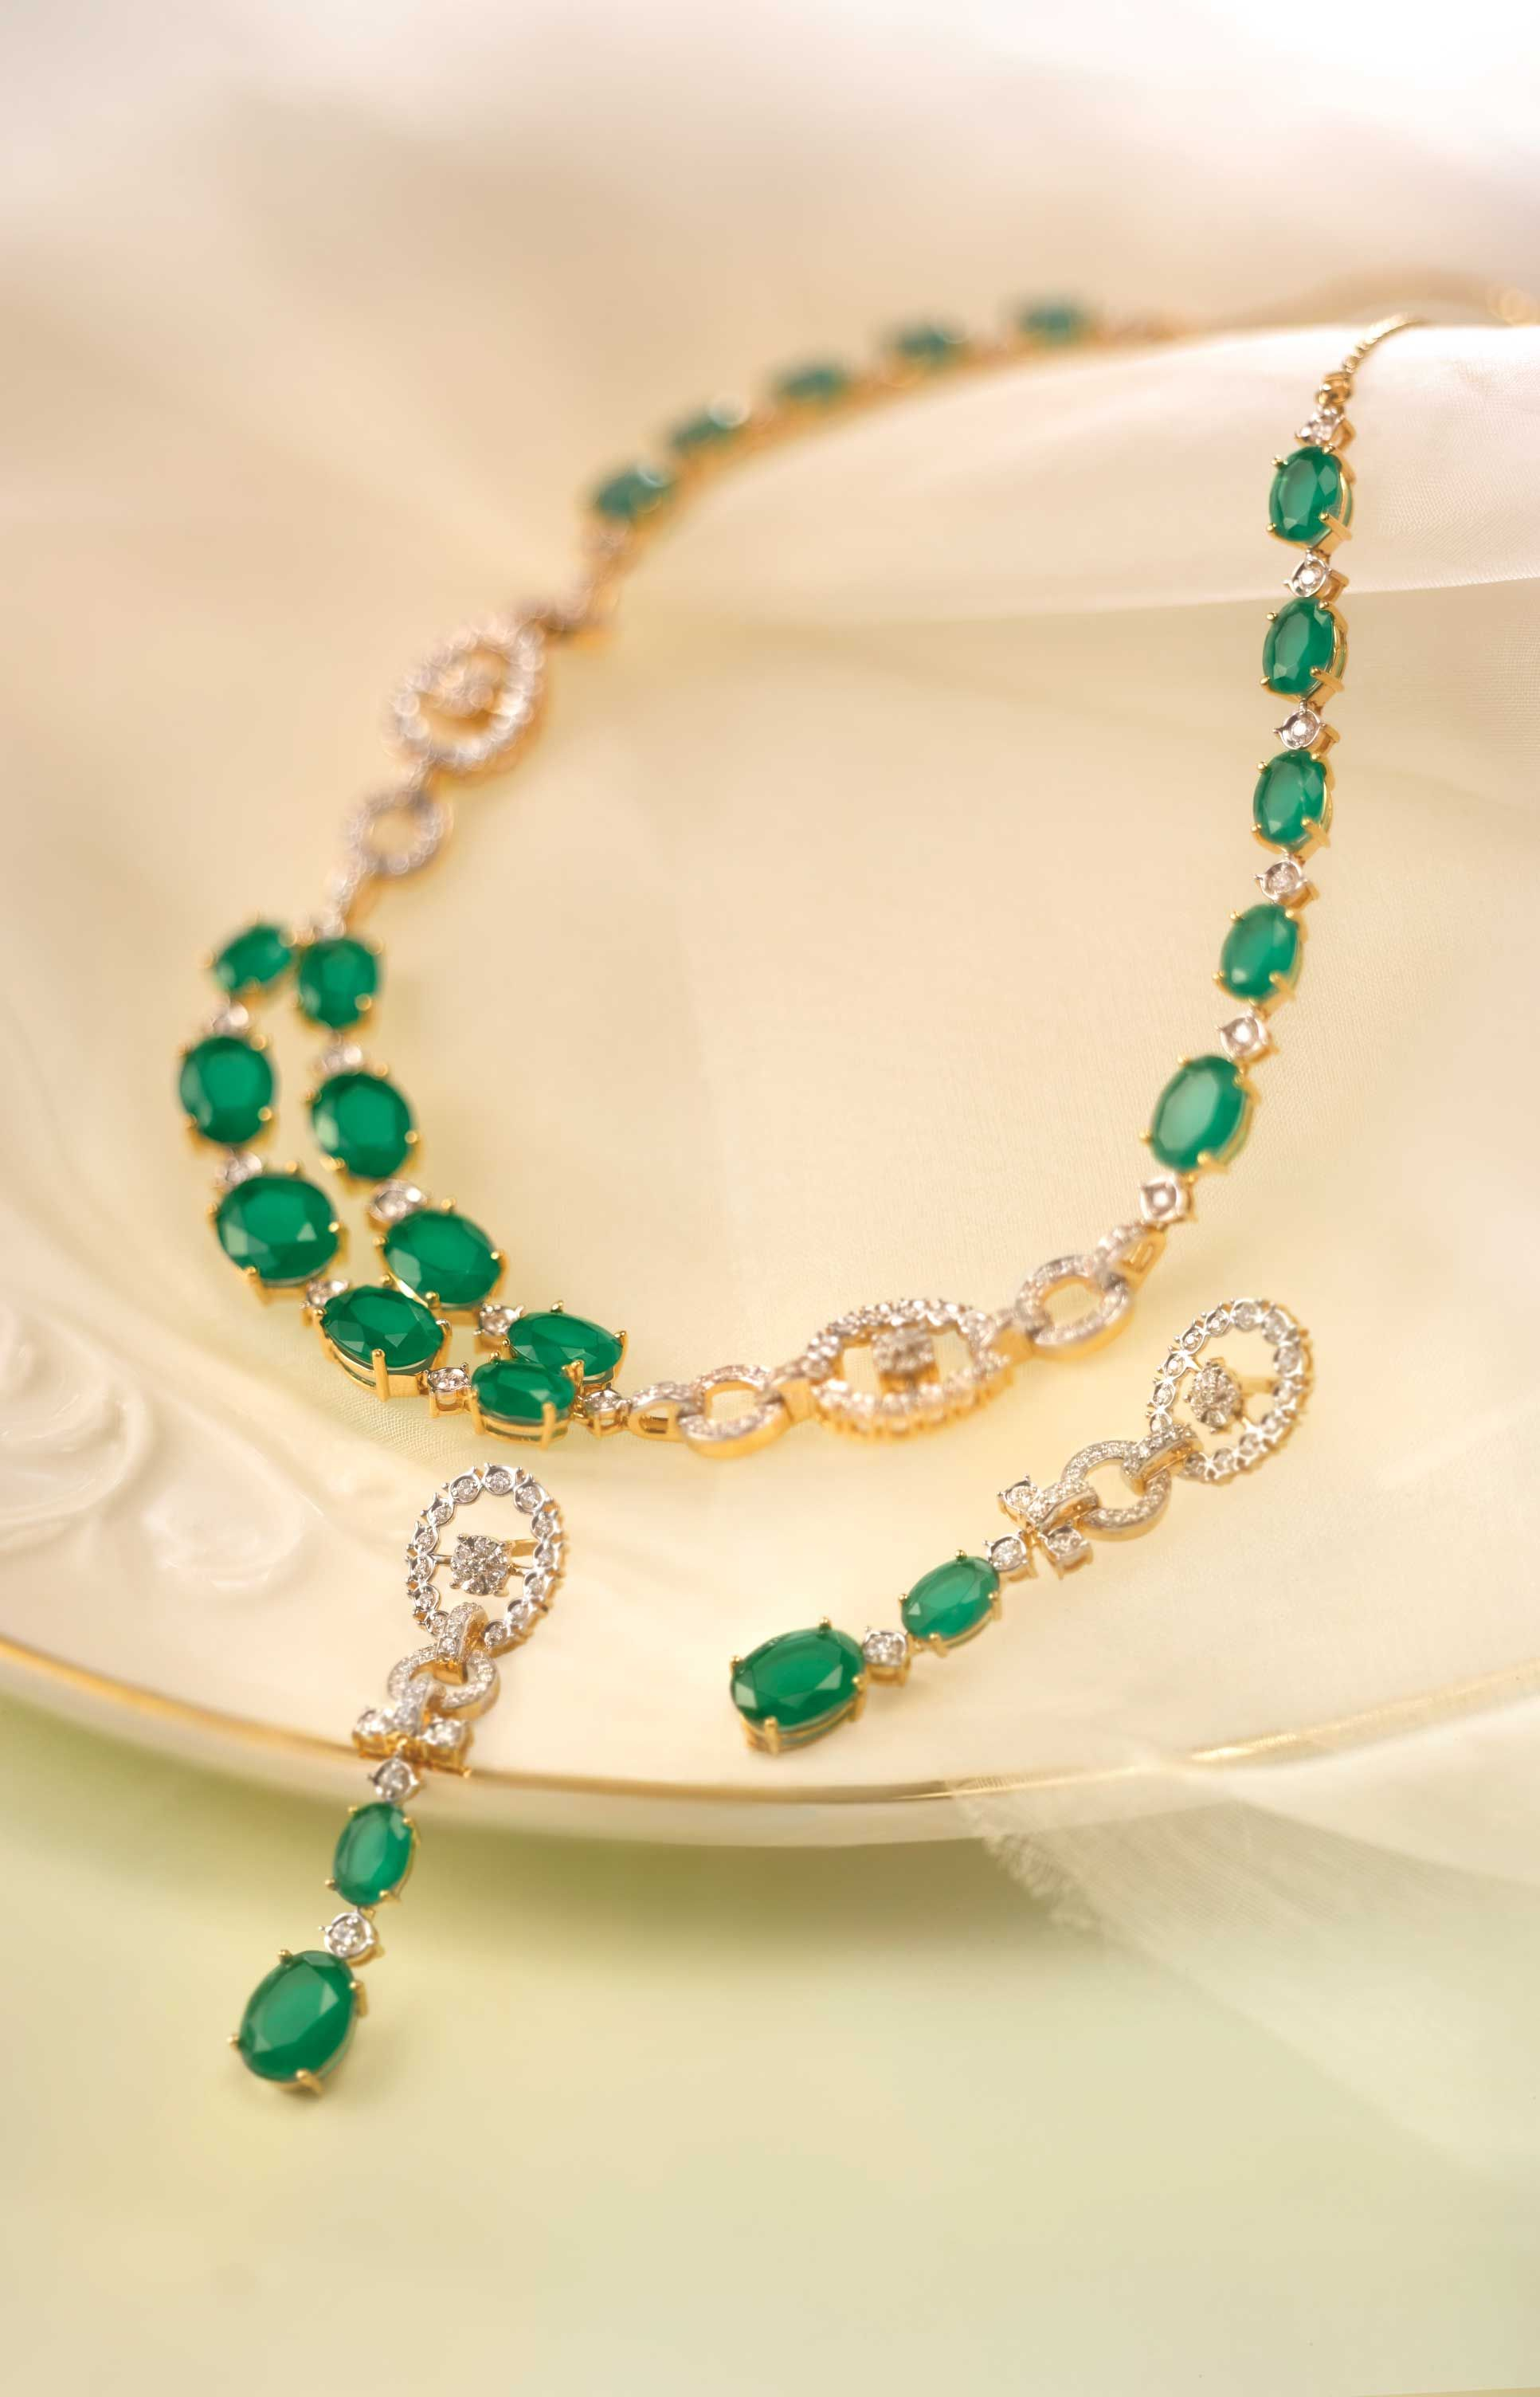 Pin by ummehani on jewelry pinterest emeralds diamond and